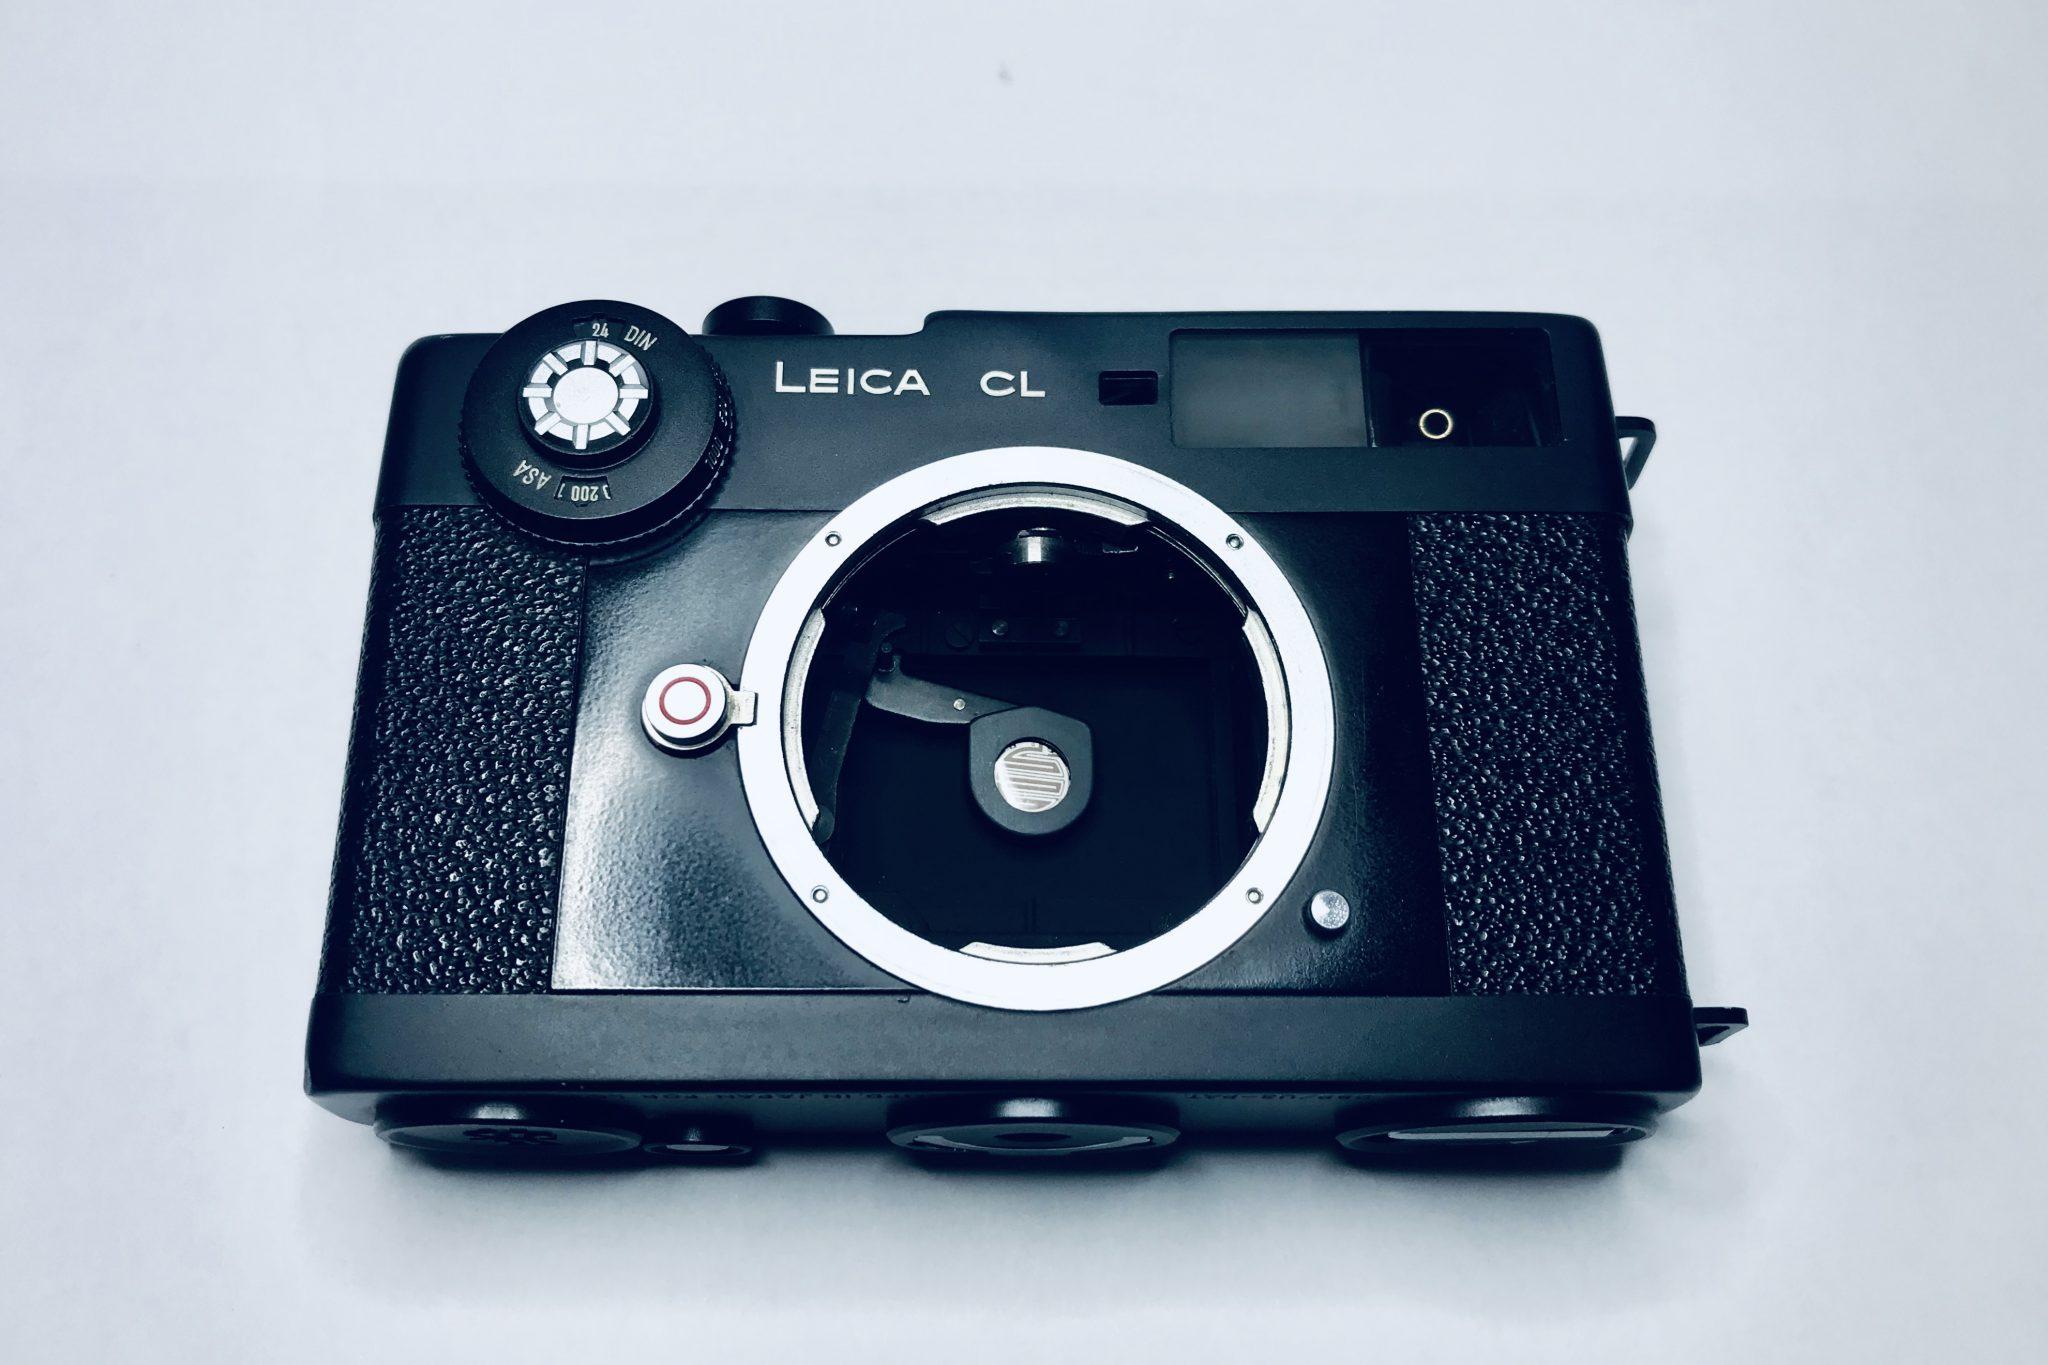 Leica CL Meßzelle